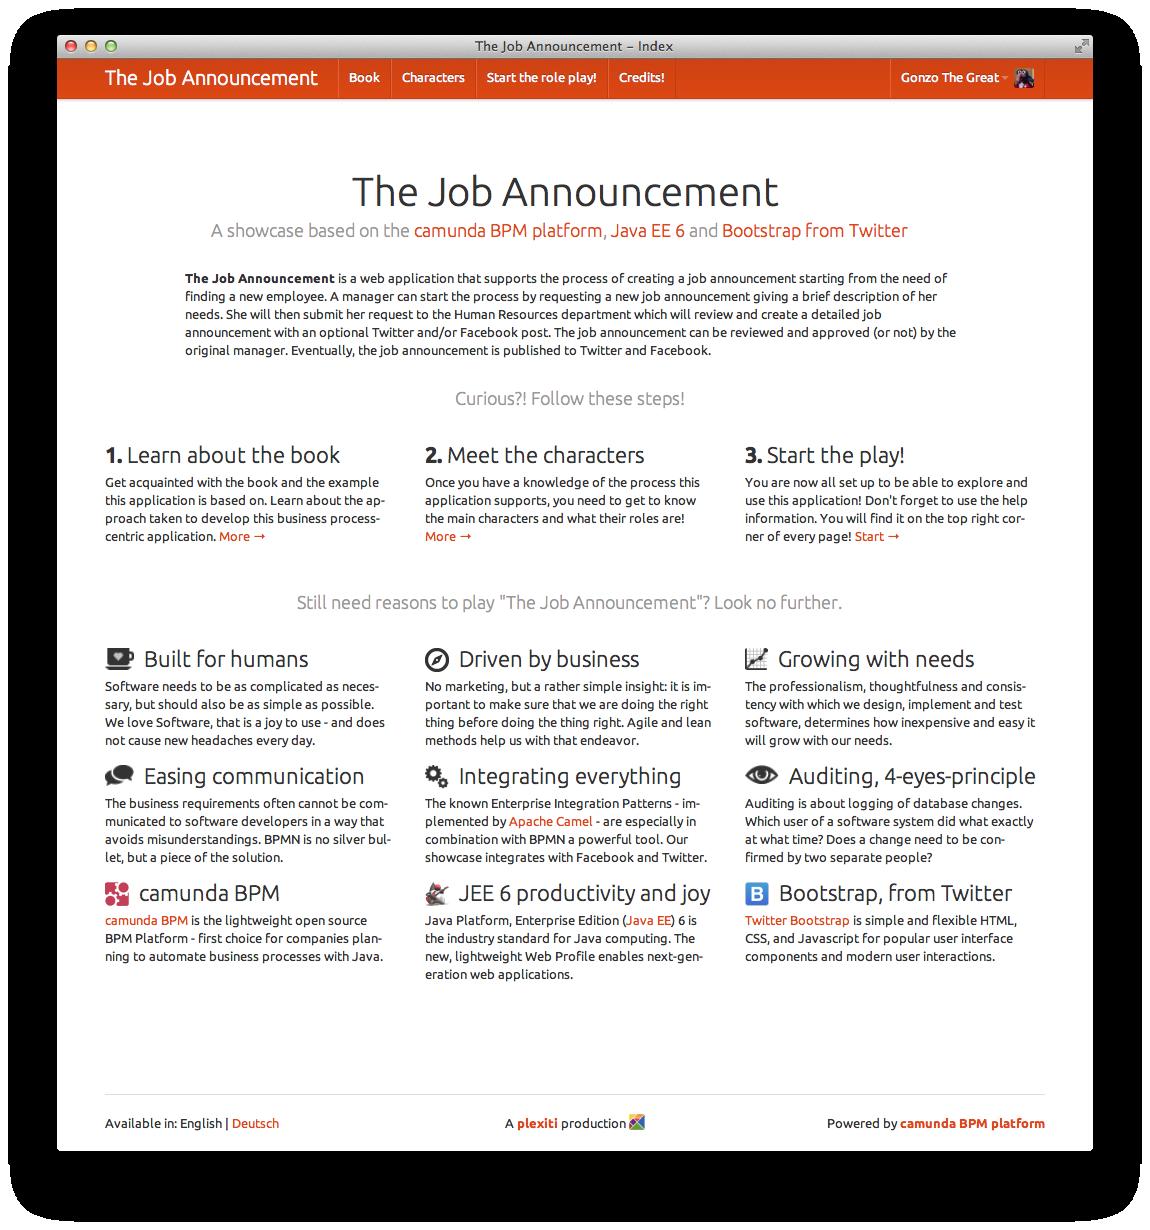 The Job Announcement Splash Screen